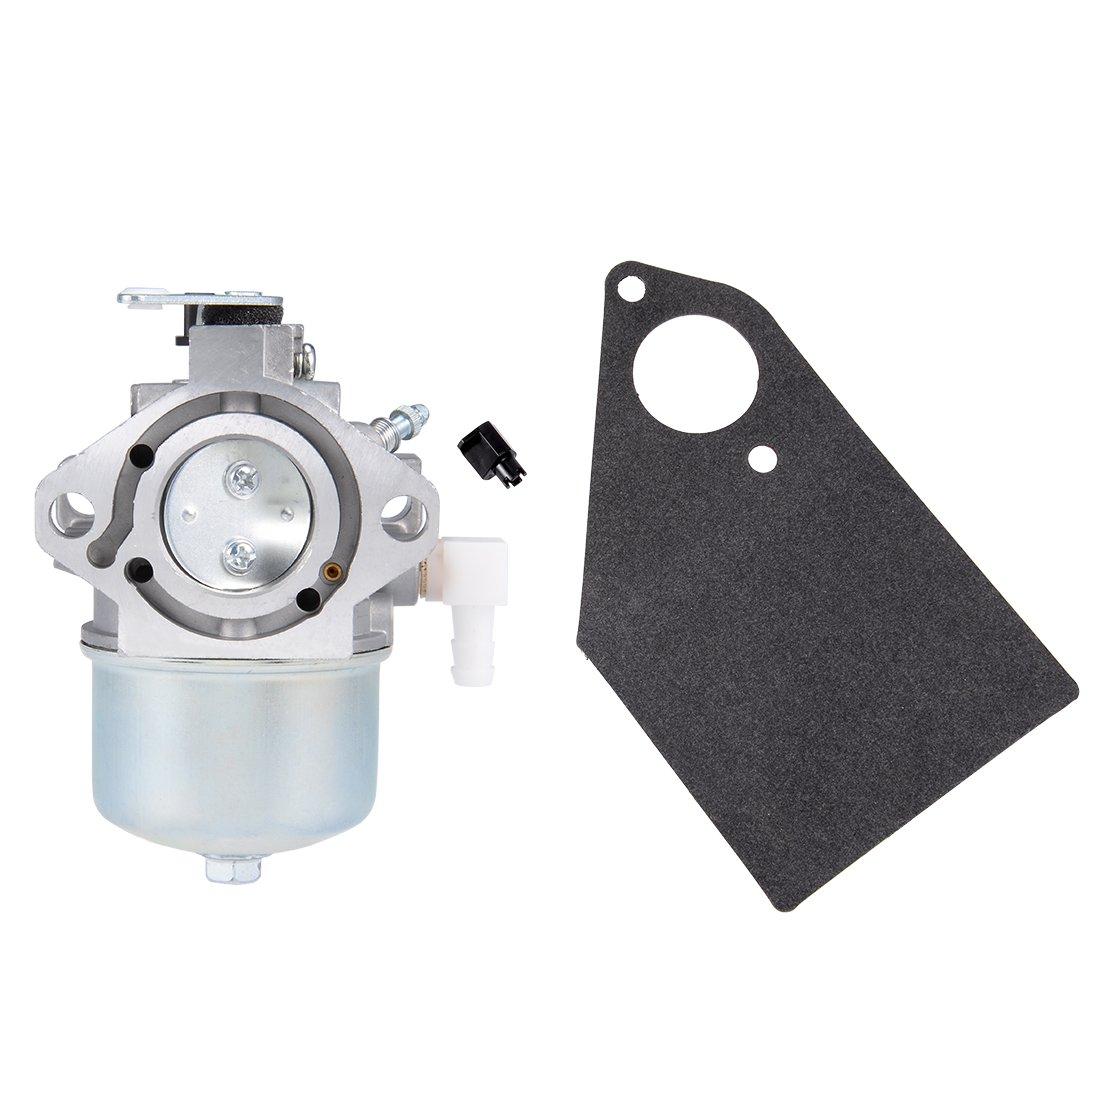 uxcell/® 12-853-57-S Carburetor Replaces fits Kohler 12-853-82-S 12-853-139S for CV12.5 CV13S CV14S CV15S Engine Carb with Gasket